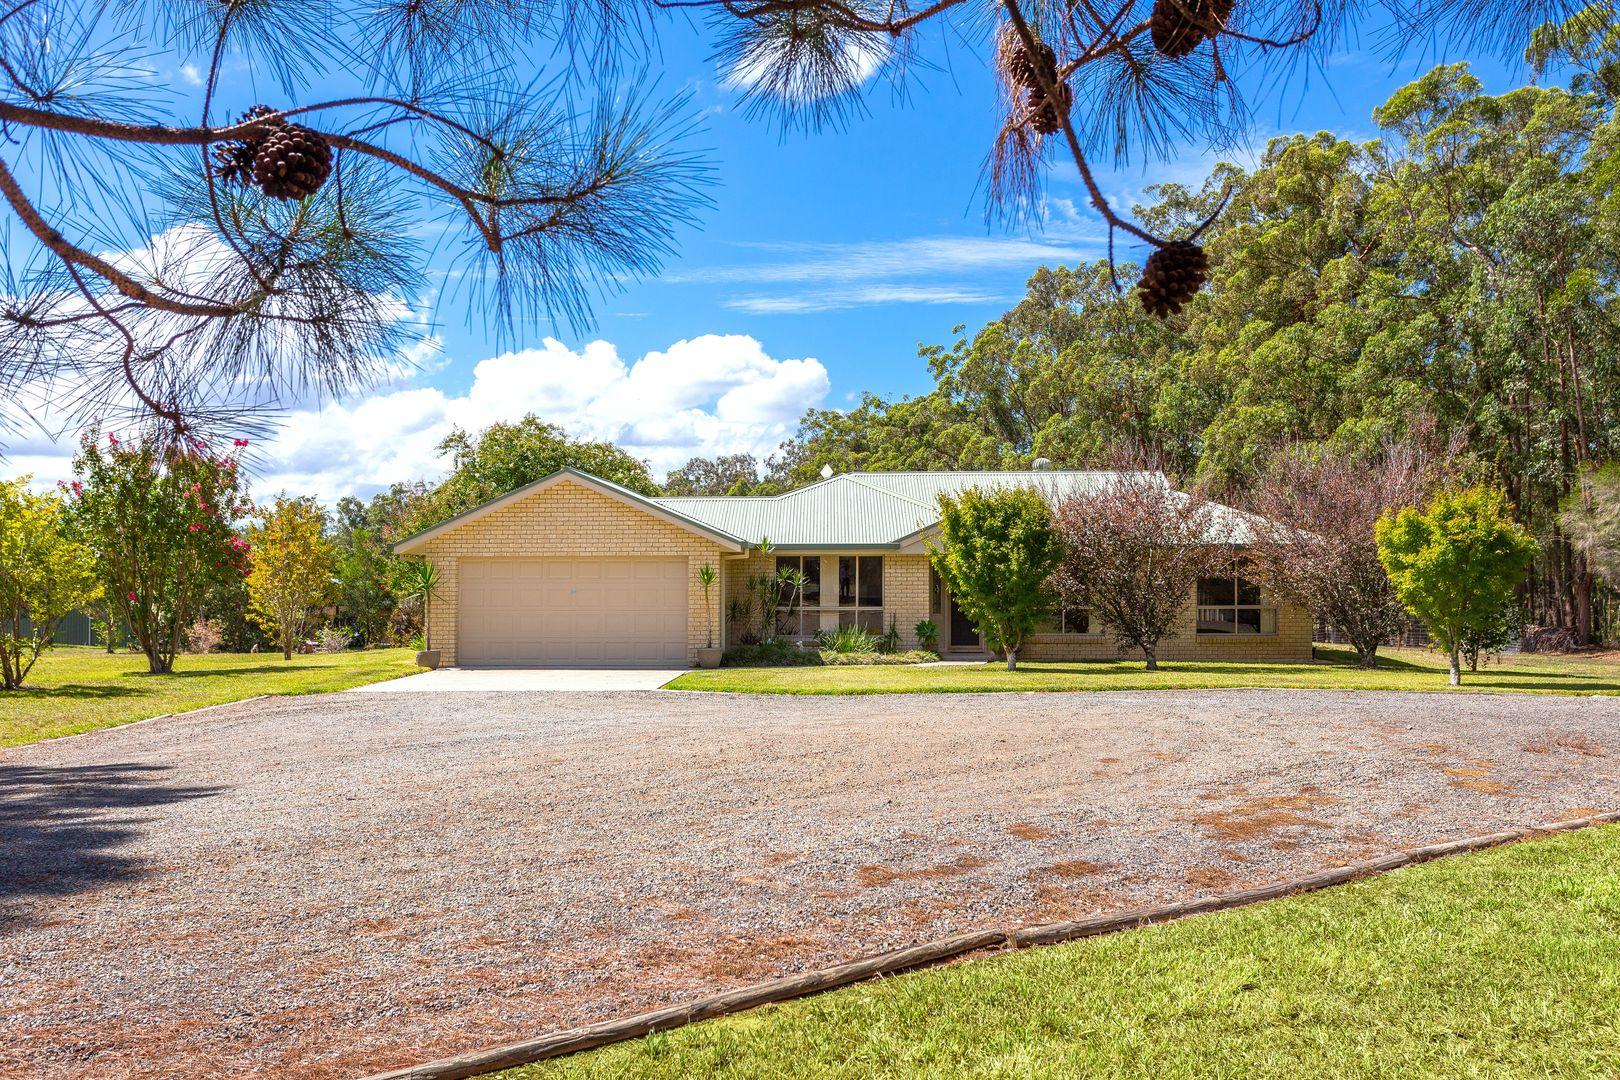 72 Malcolms Road, Pampoolah NSW 2430, Image 0